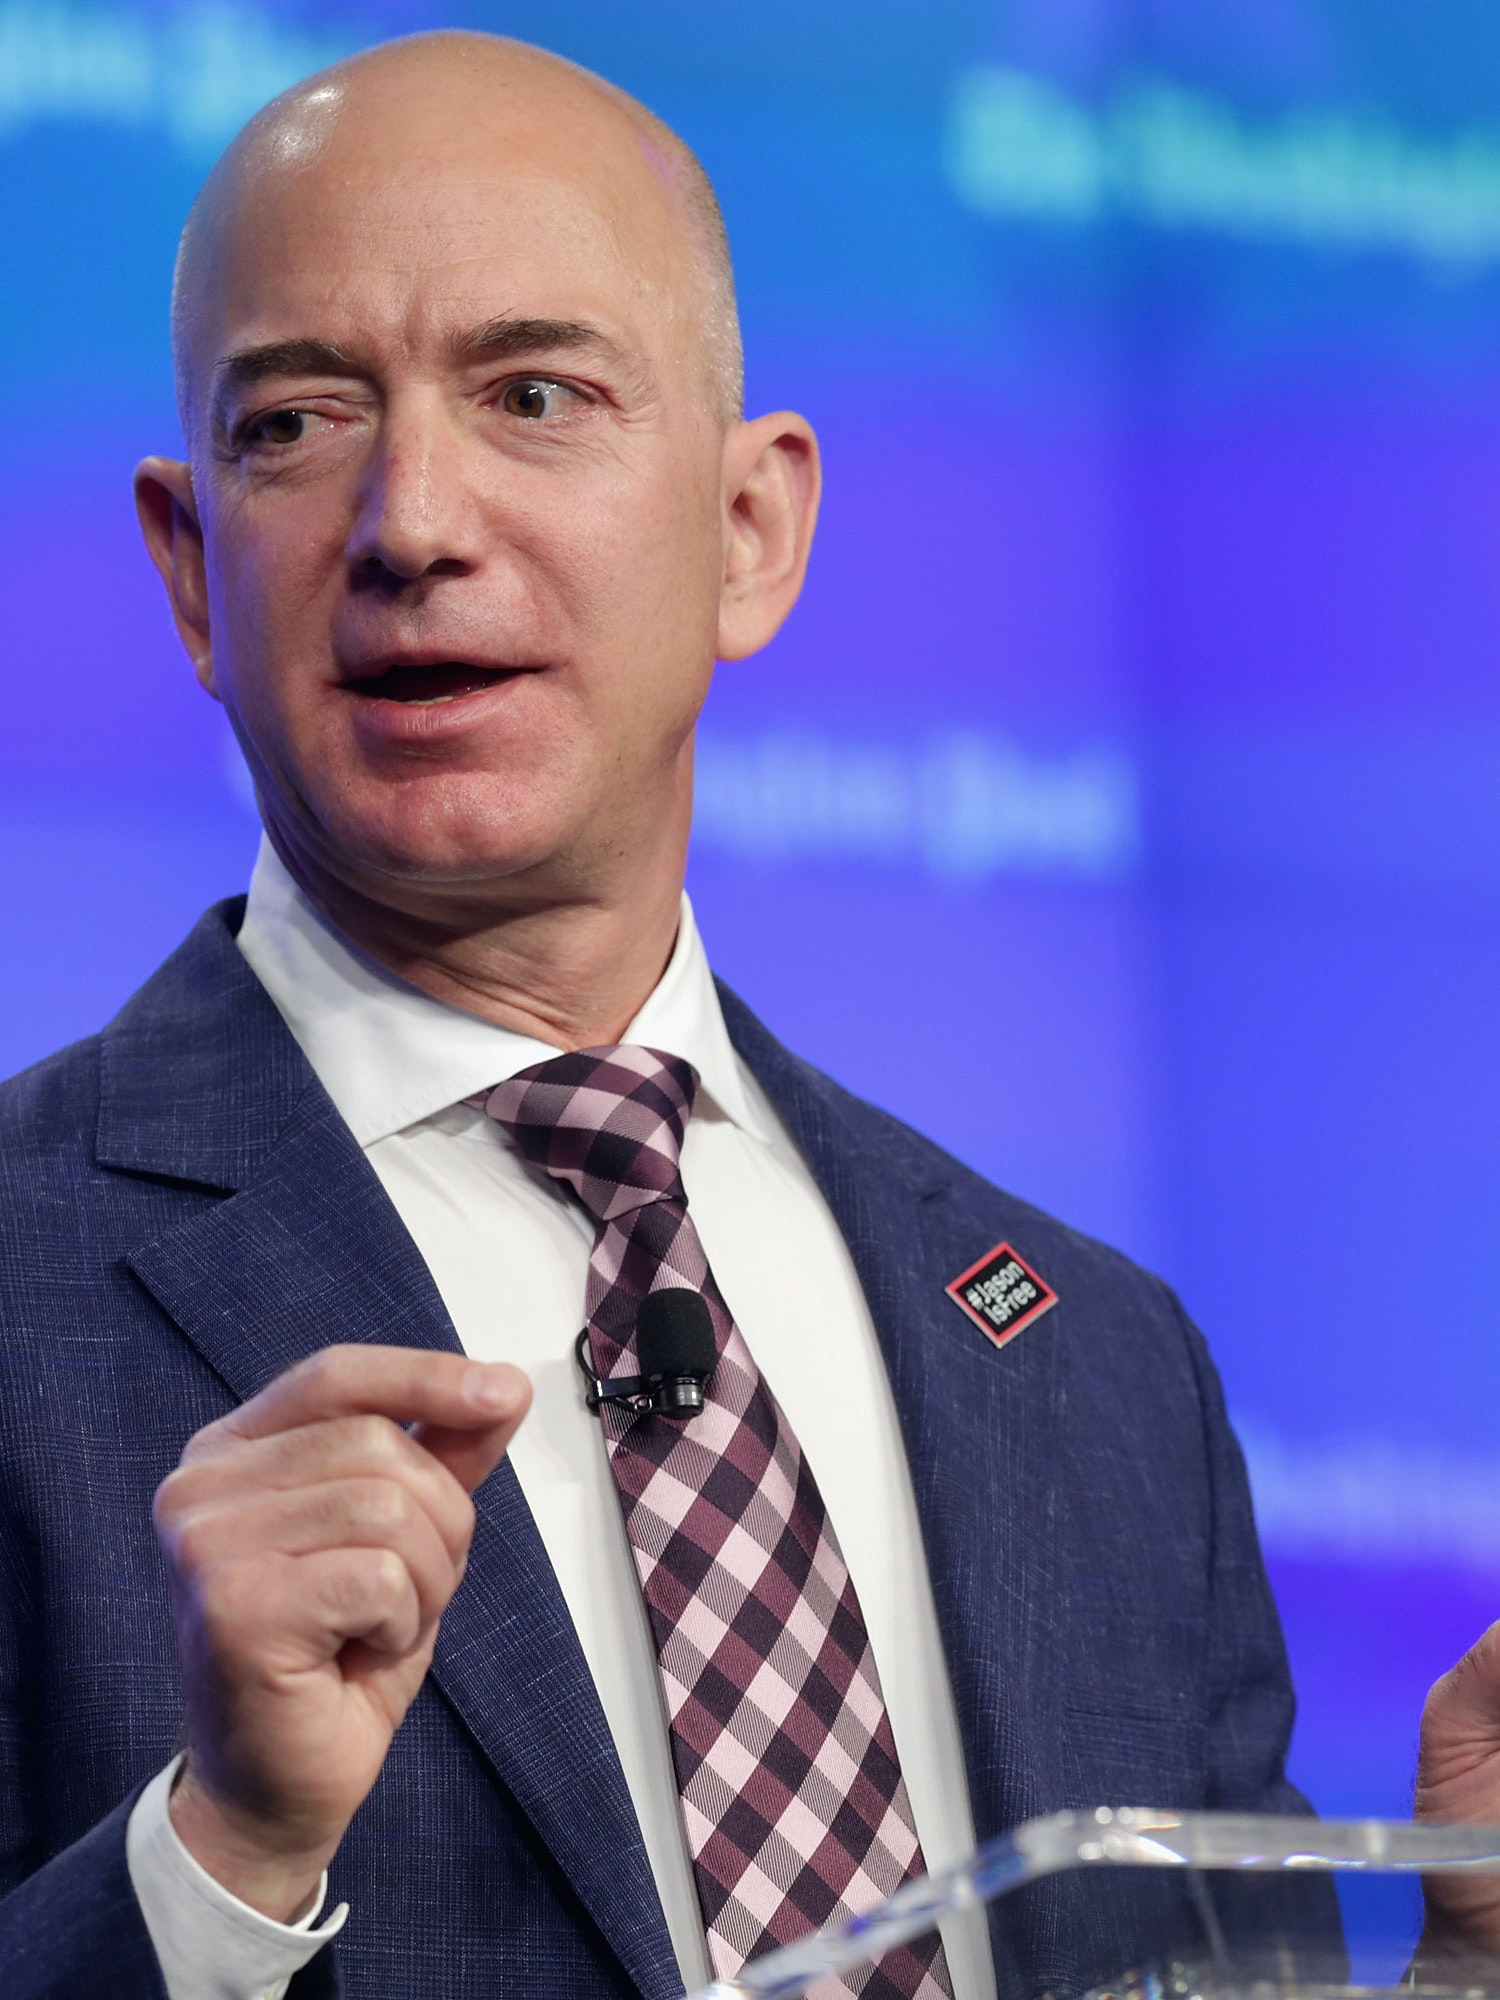 Blue Origin S Jeff Bezos Becomes World S 4th Richest Billionaire After Amazon Stock Sale Inverse